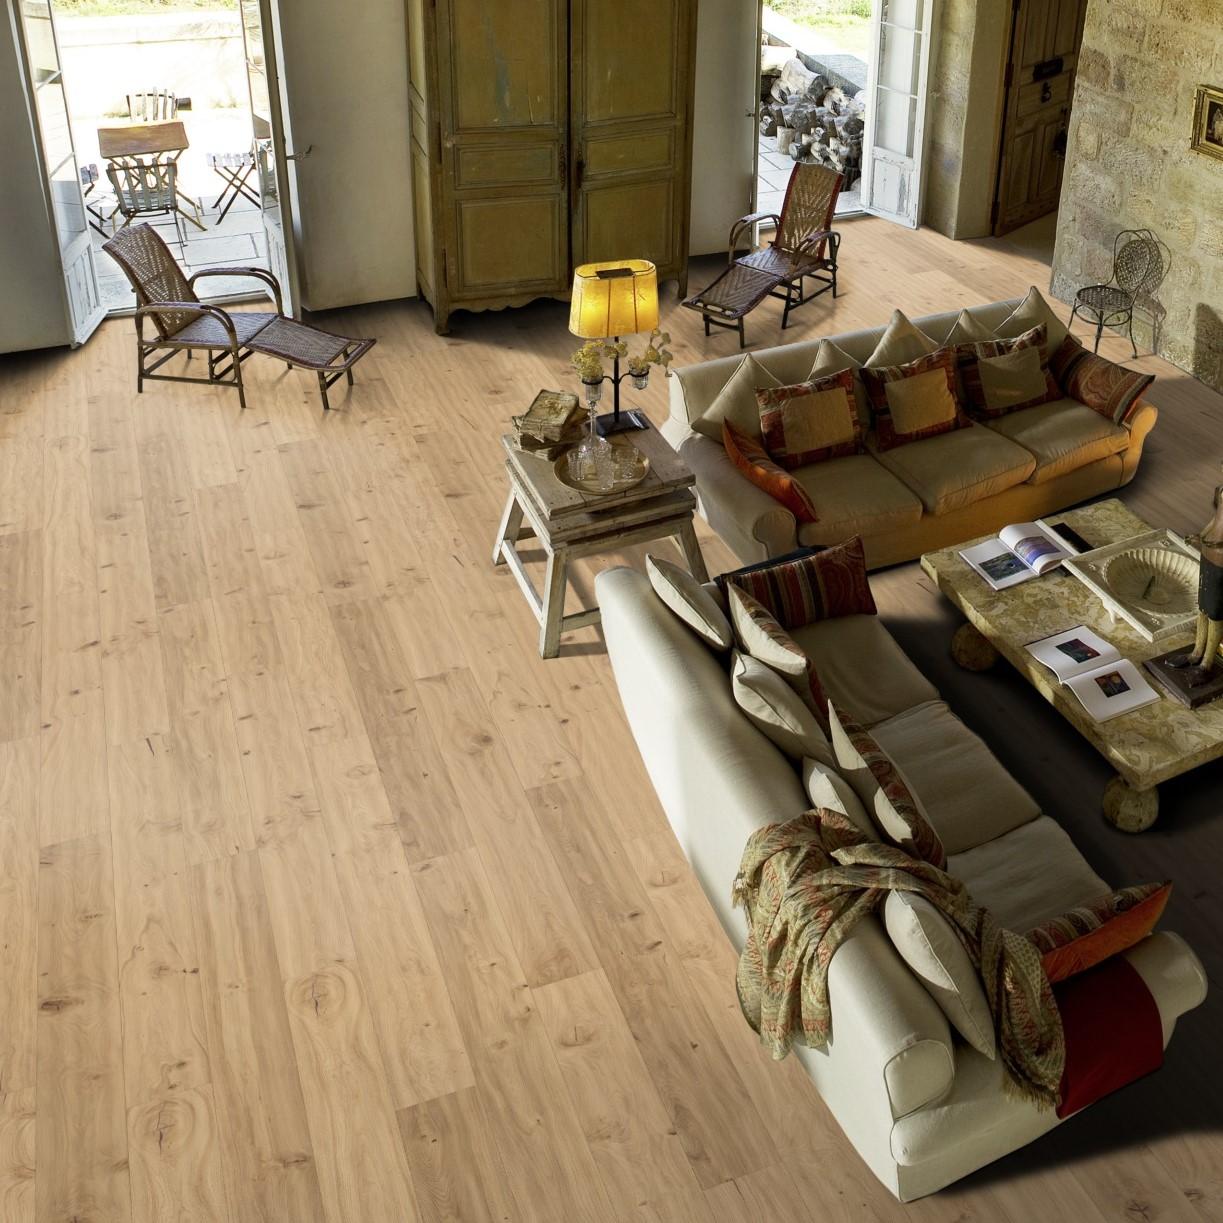 Kahrs Smaland Klinta Rustic Oak Engineered Wood Flooring